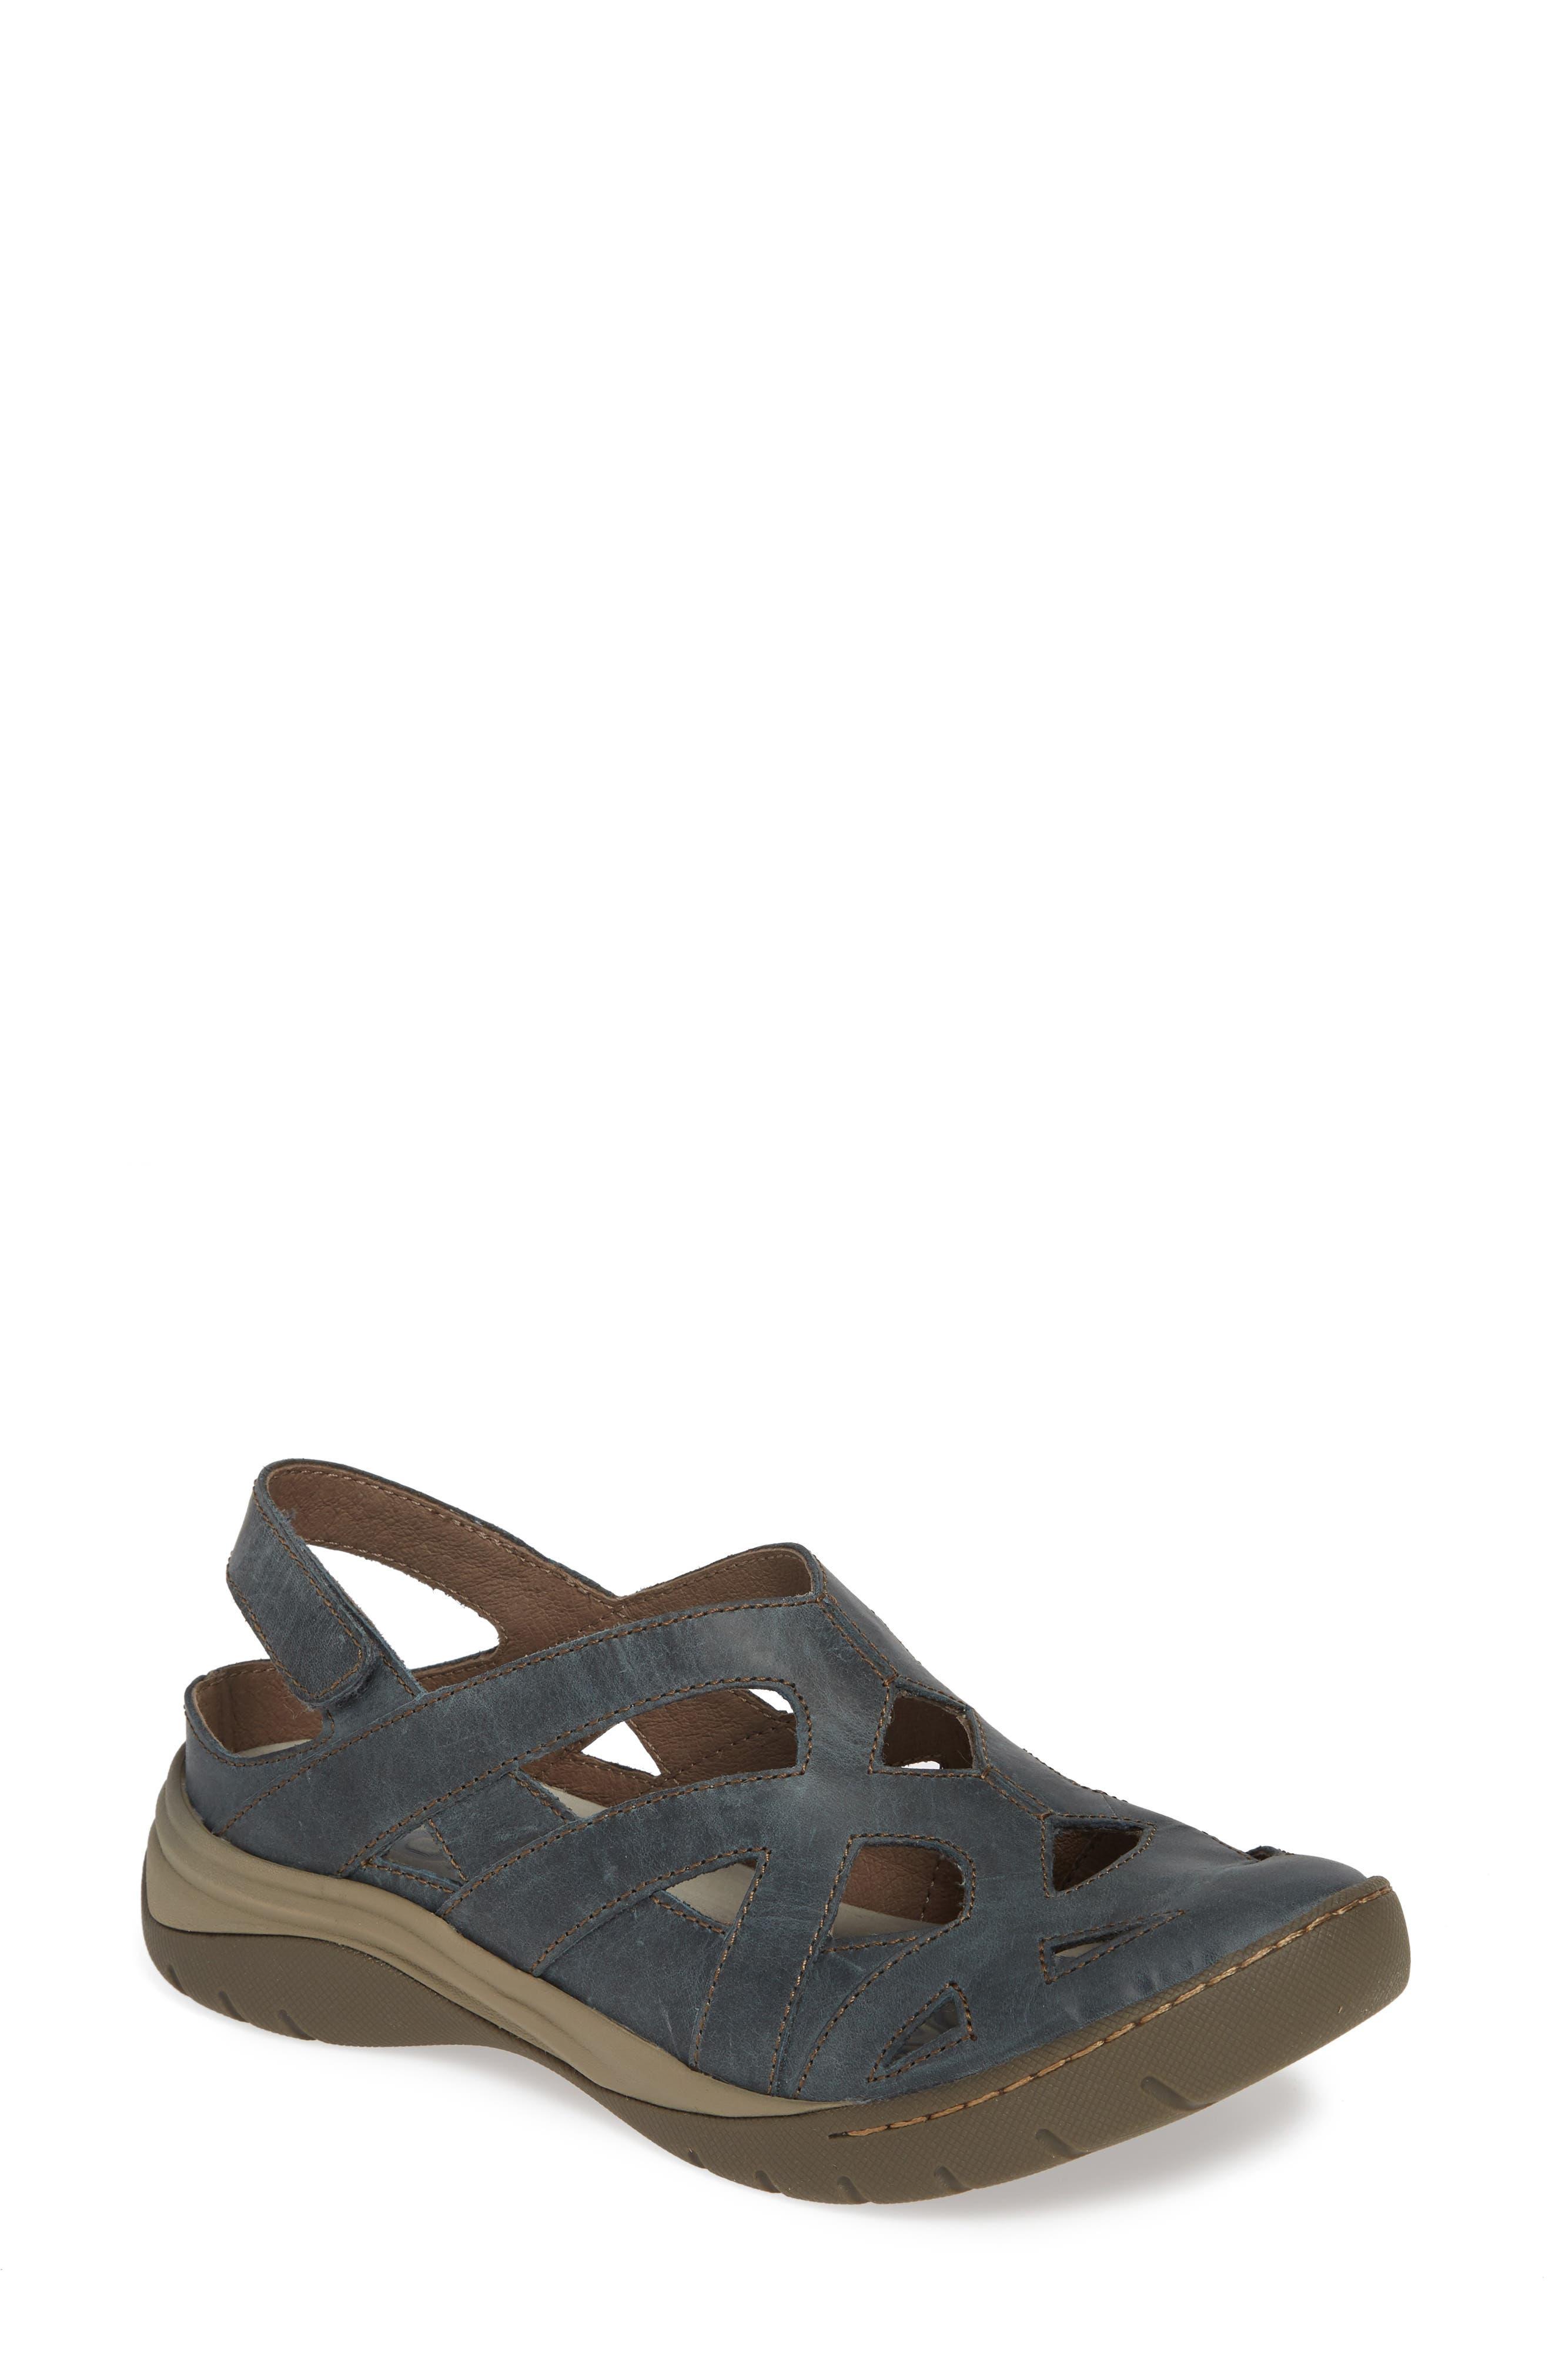 Women's Bionica Maclean 2 Sandal, Size 11 M - Grey